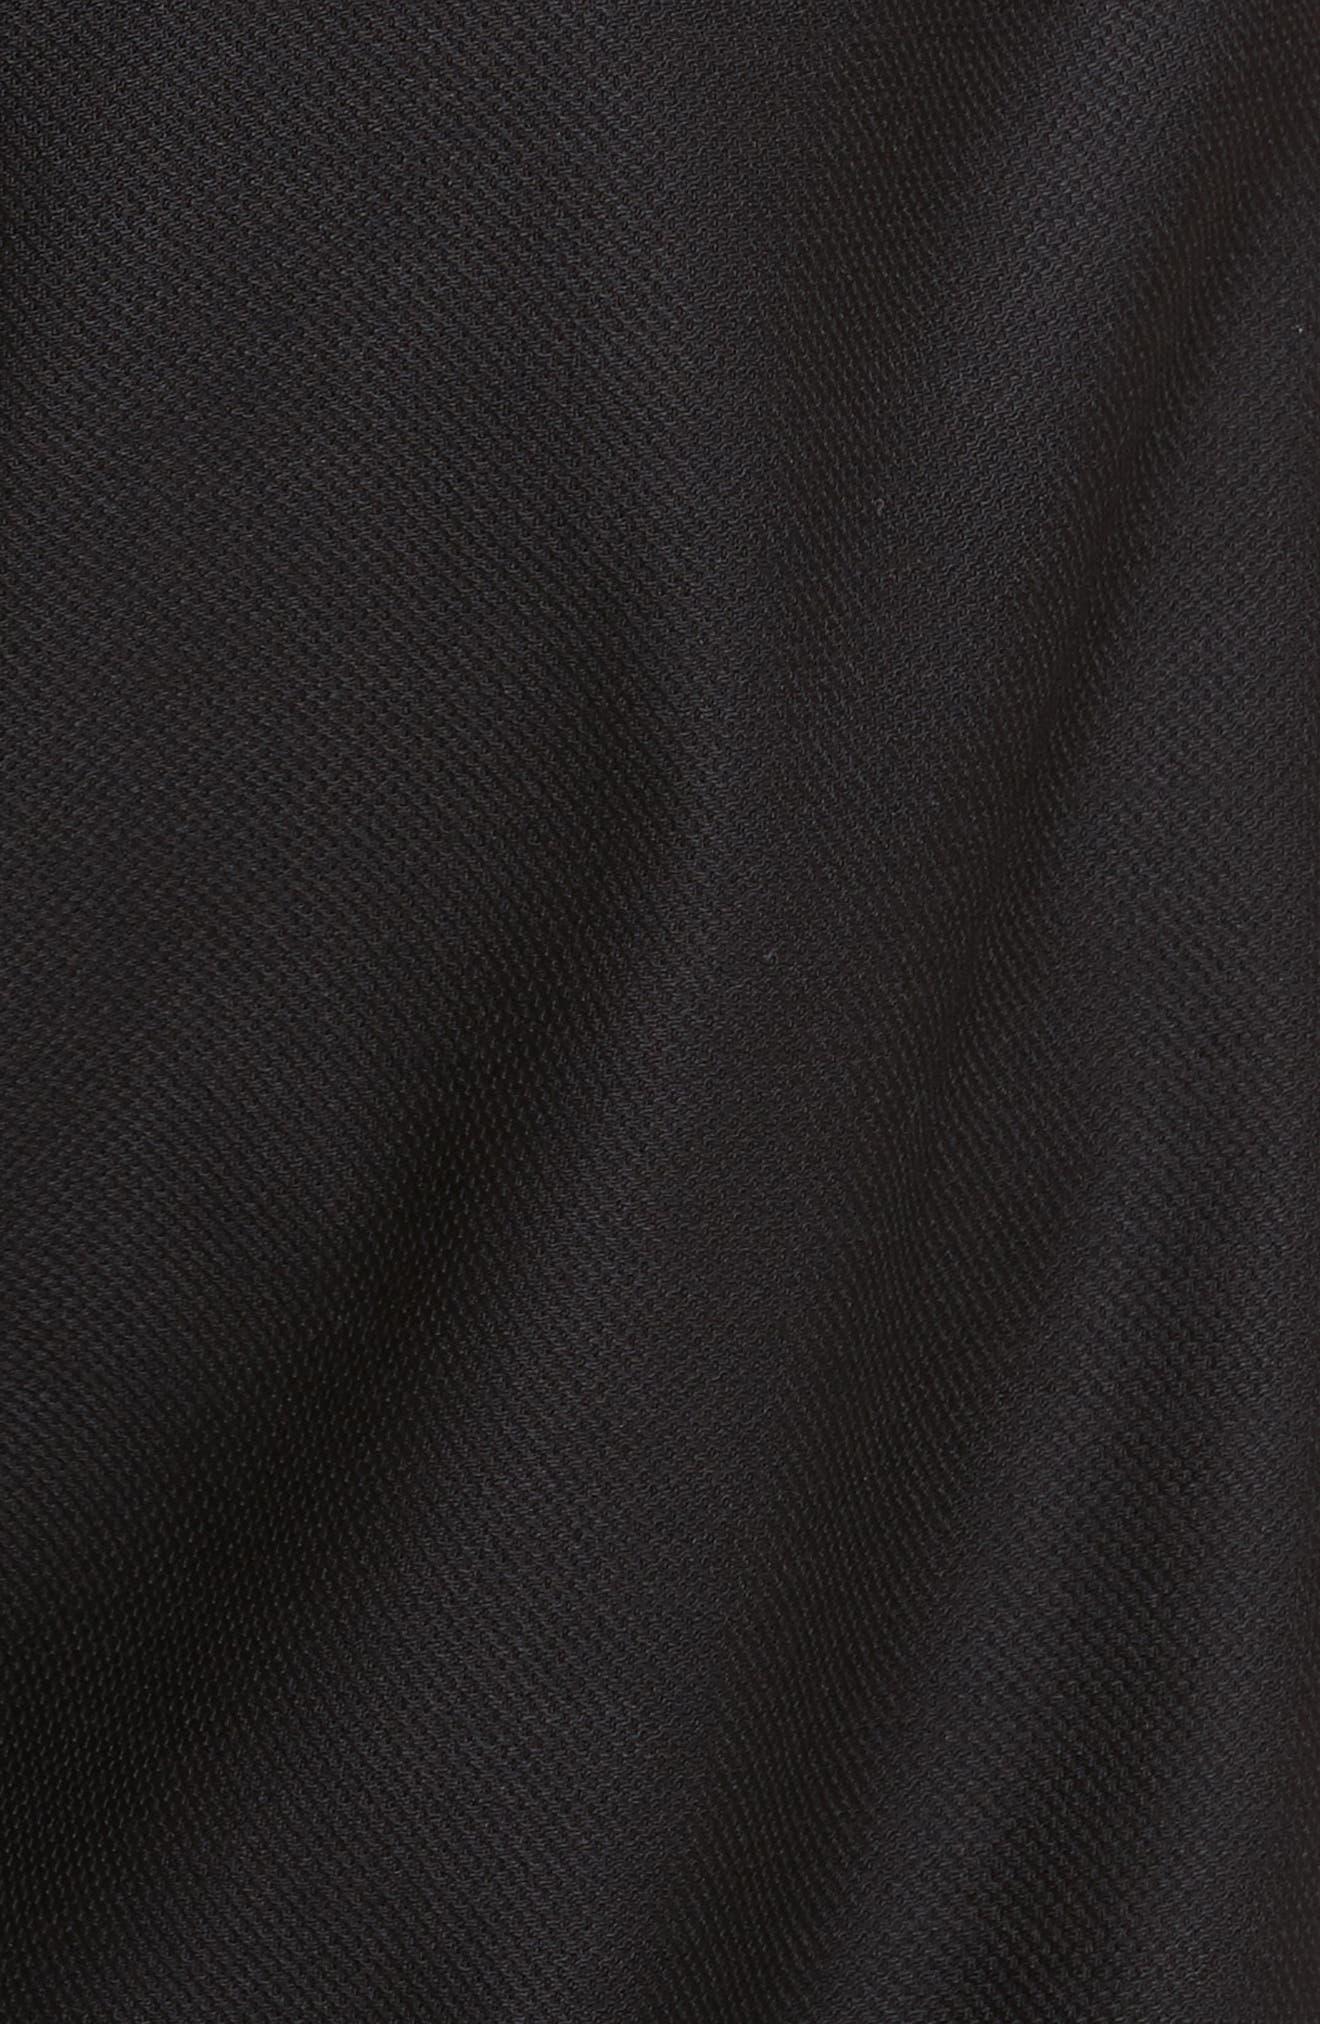 Drawstring Wool Trousers,                             Alternate thumbnail 5, color,                             001